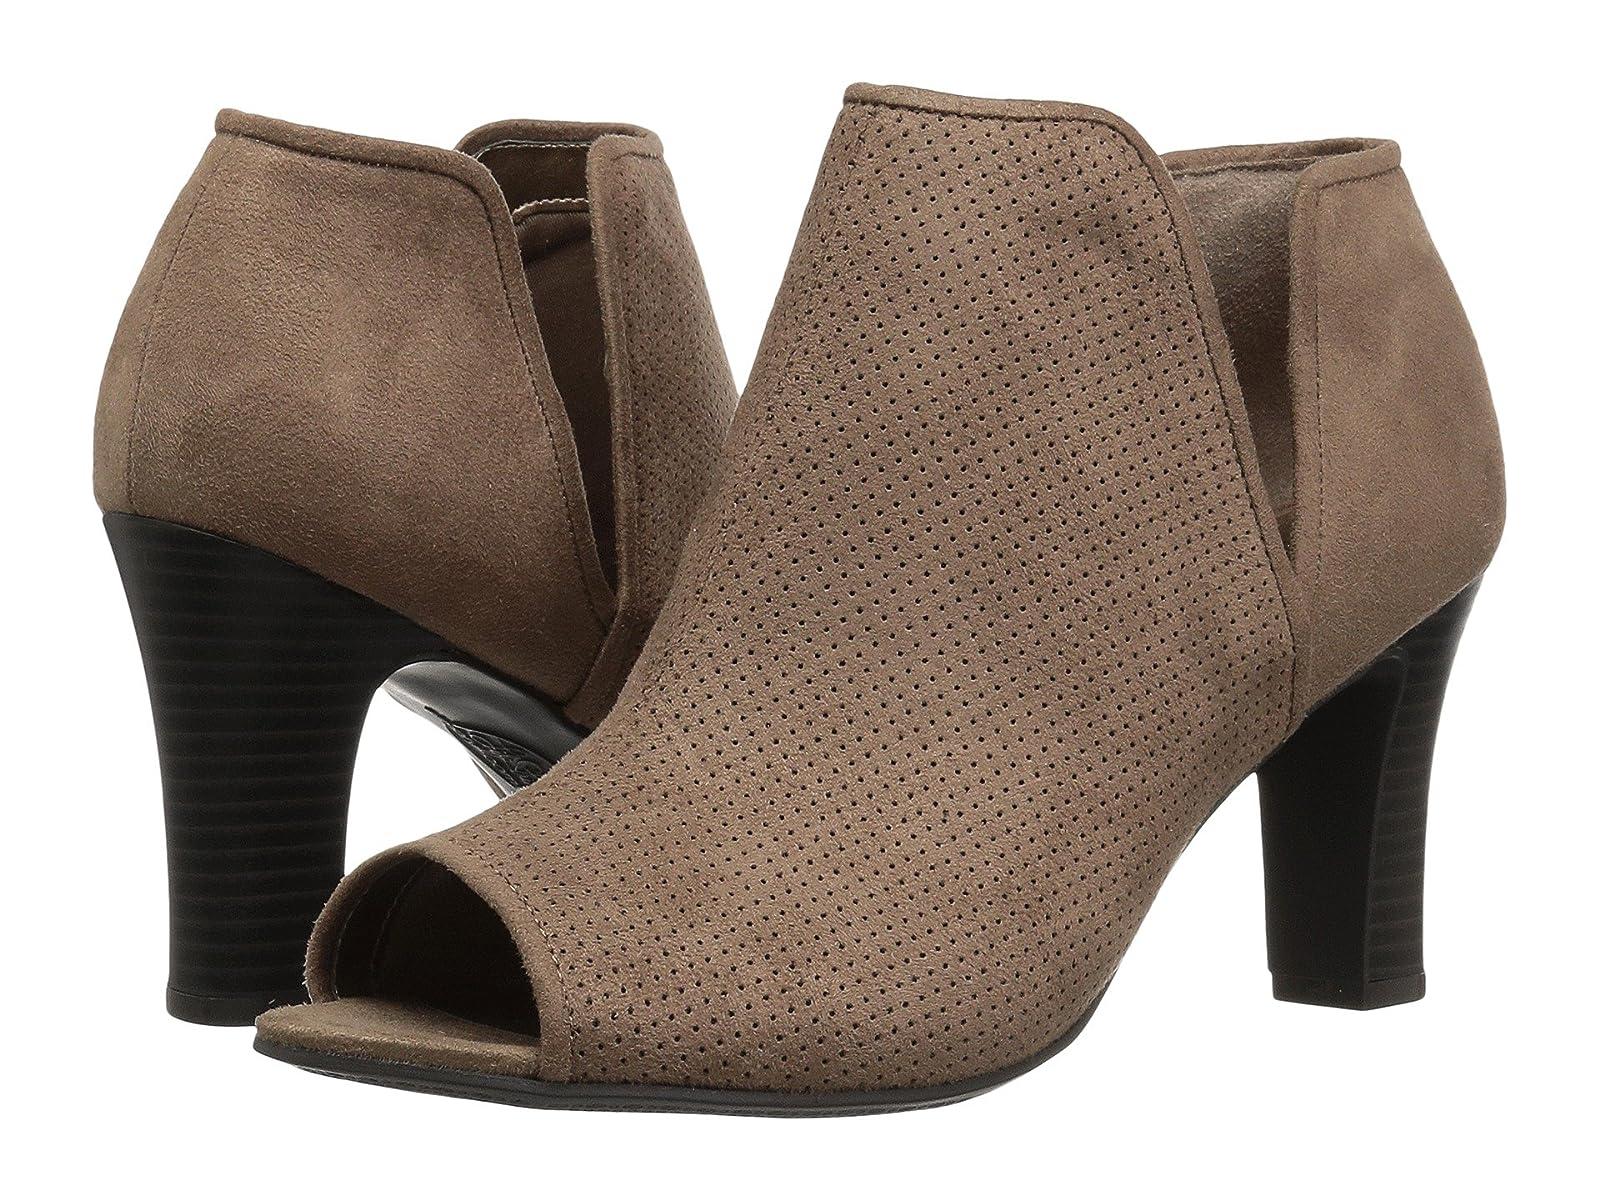 LifeStride CoanaAffordable and distinctive shoes